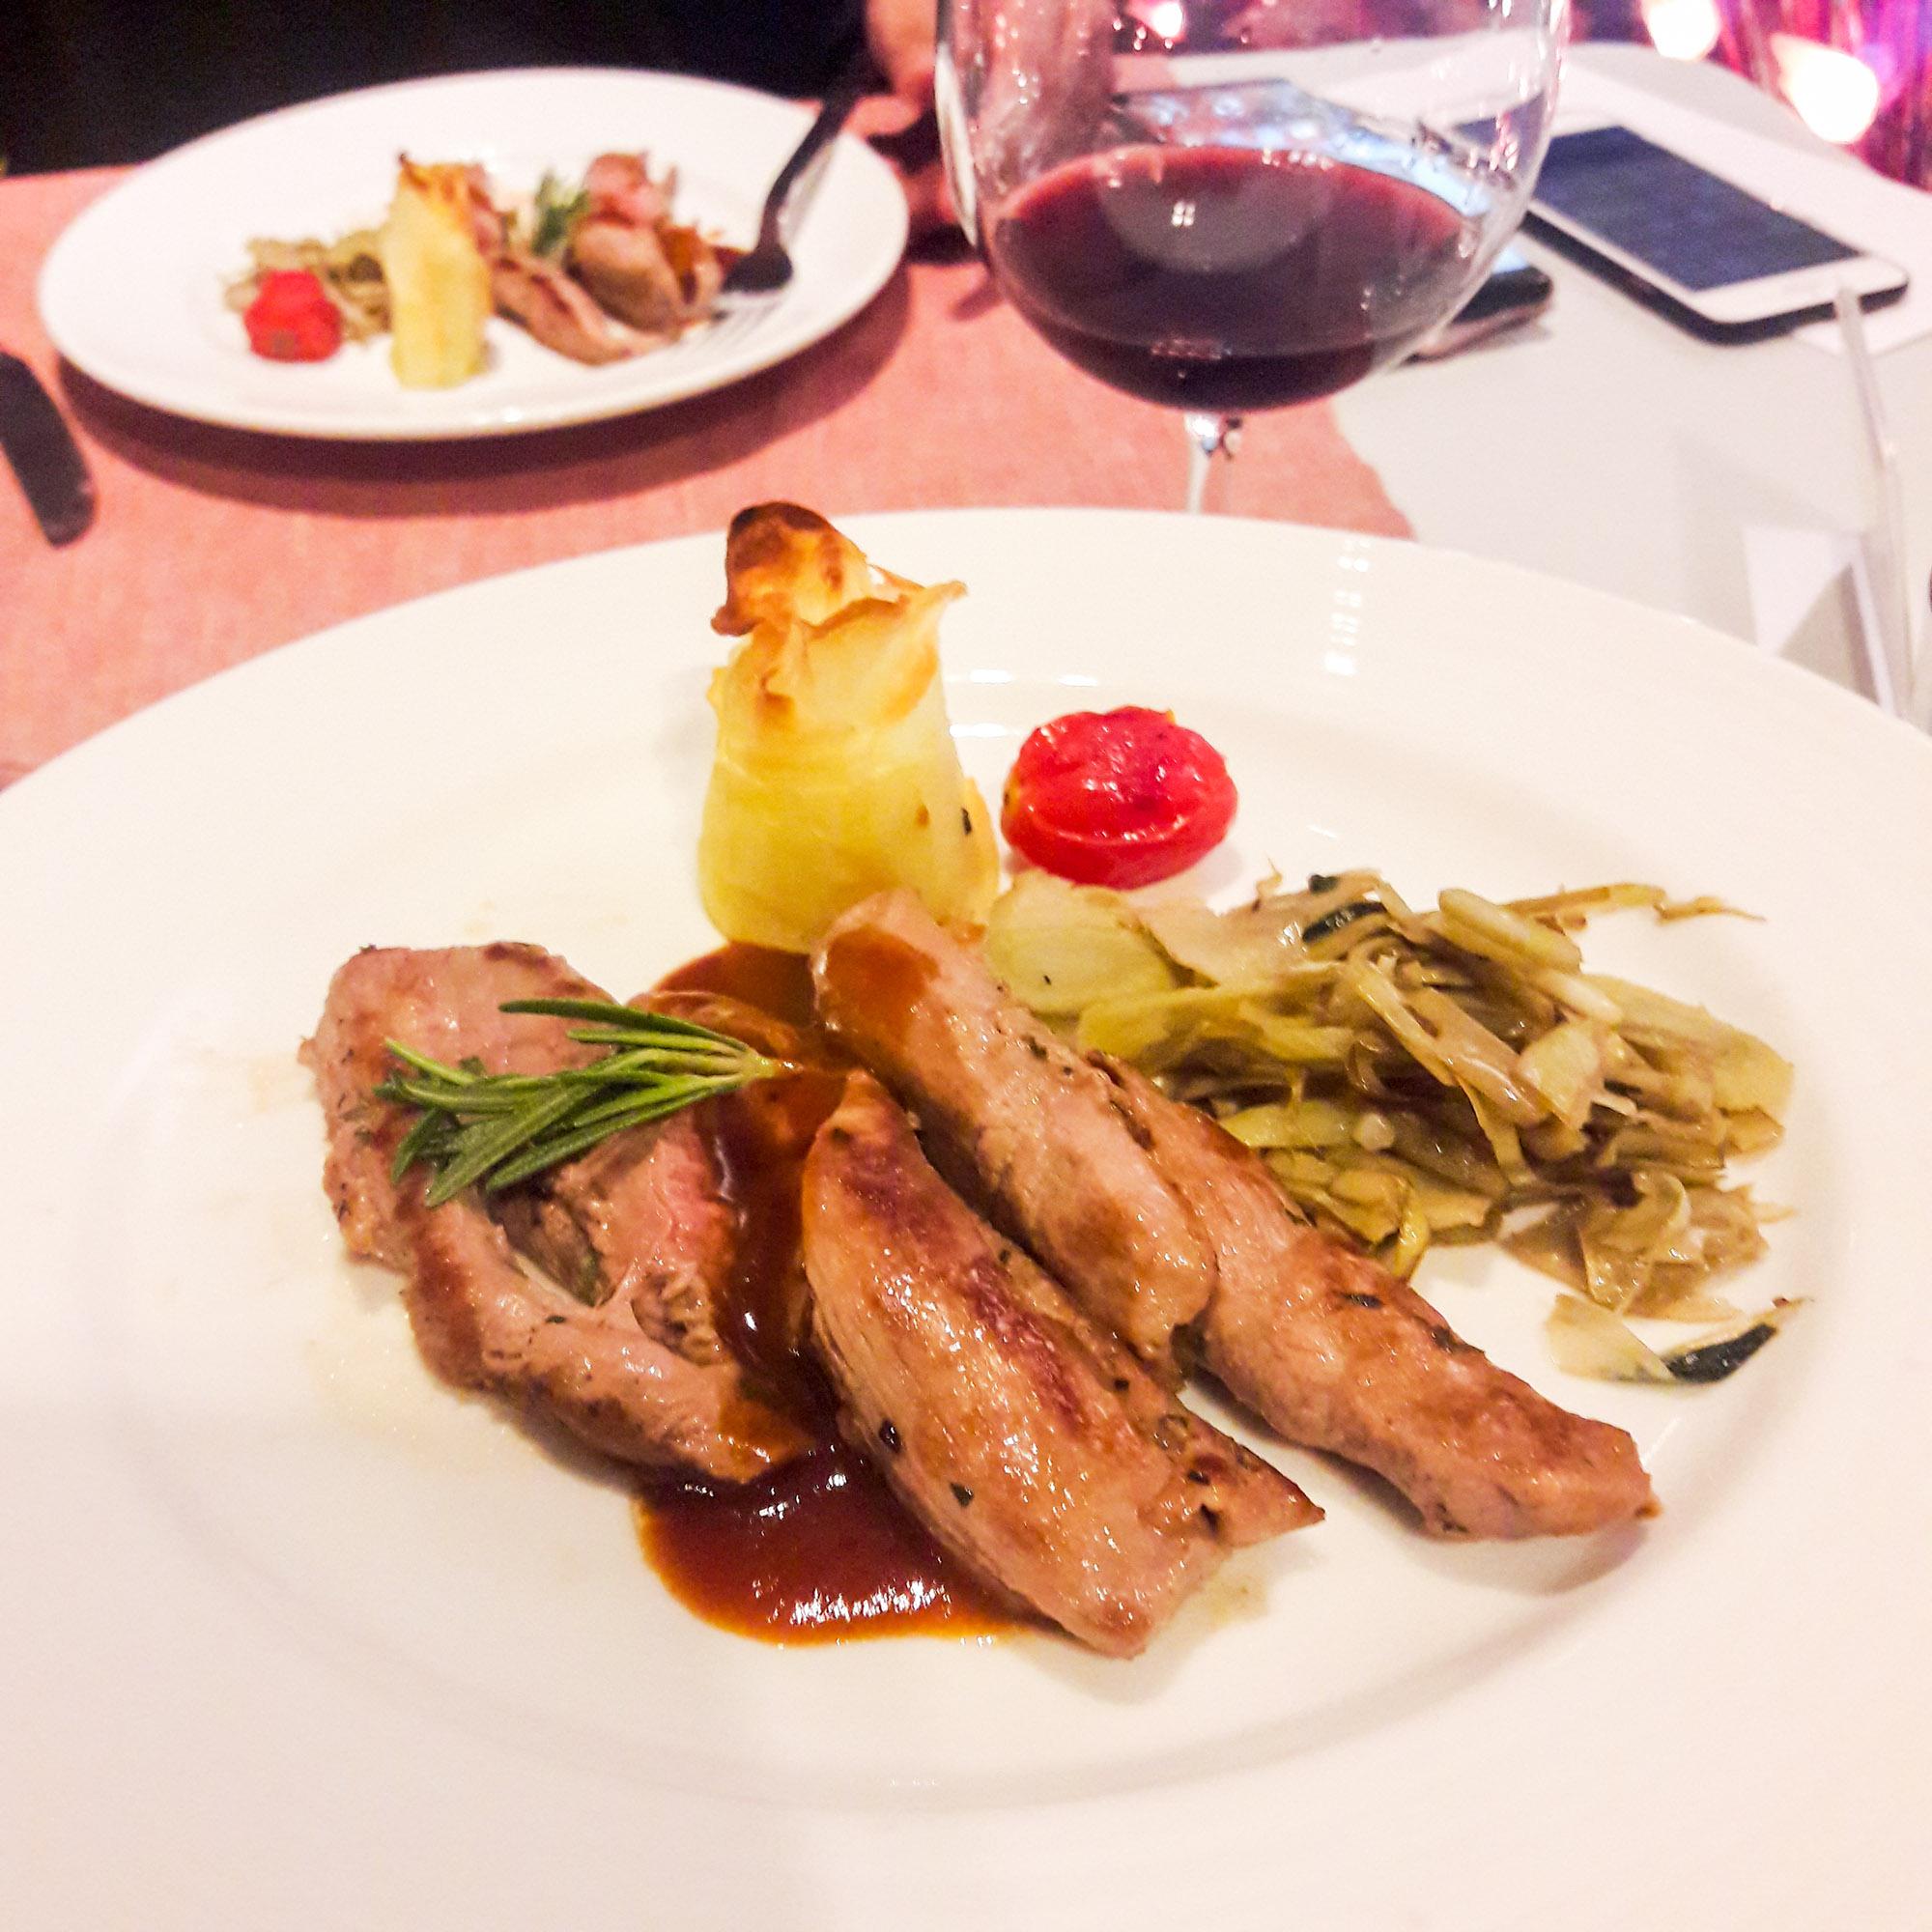 Calderazzo on 31 สุขุมวิท ร้านอาหารอิตาเลี่ยน  Calderazzo on 31 อาหารอิตาเลี่ยนแท้ๆ จัดแพริ่งไวน์ และ Grand Opening 20180510 212611